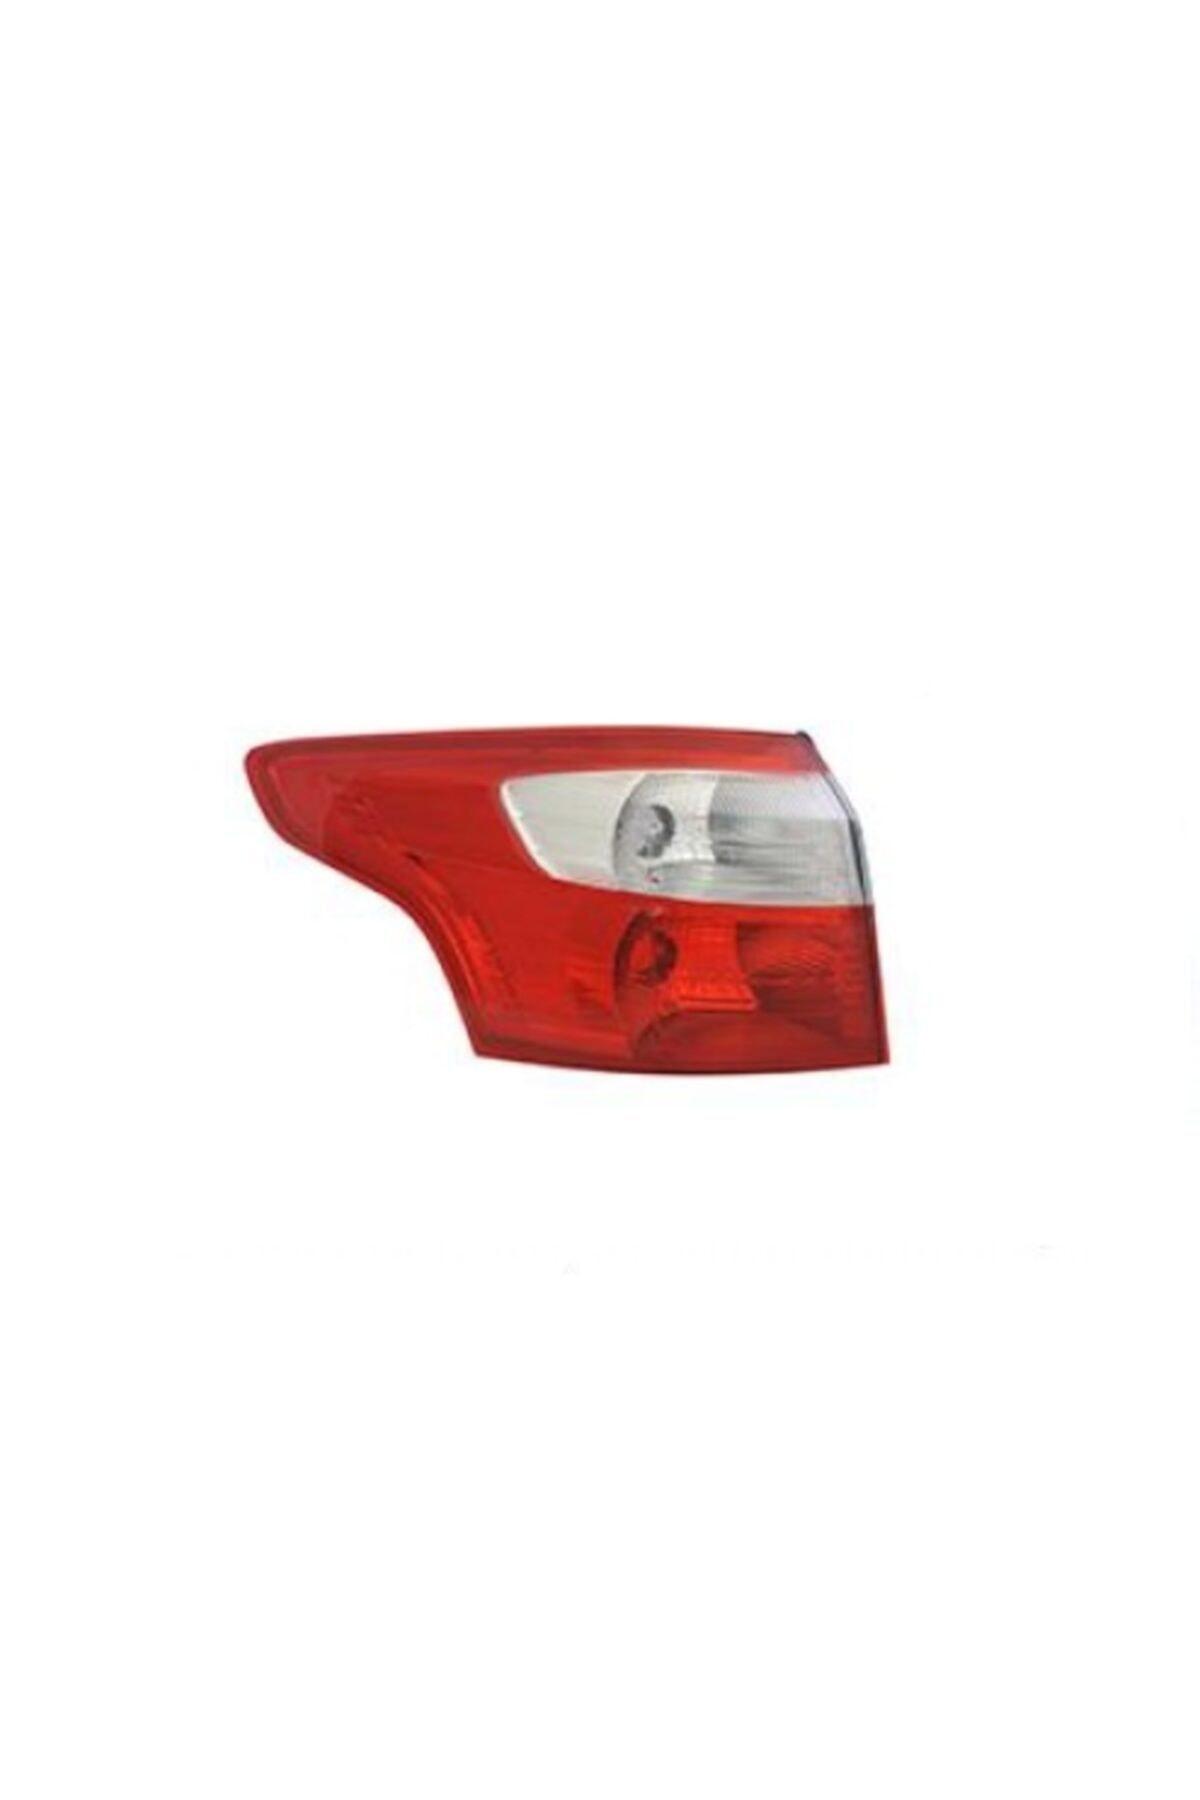 DEGA Ford Focus 2011-2015 Arka Stop Sw. Sol 1